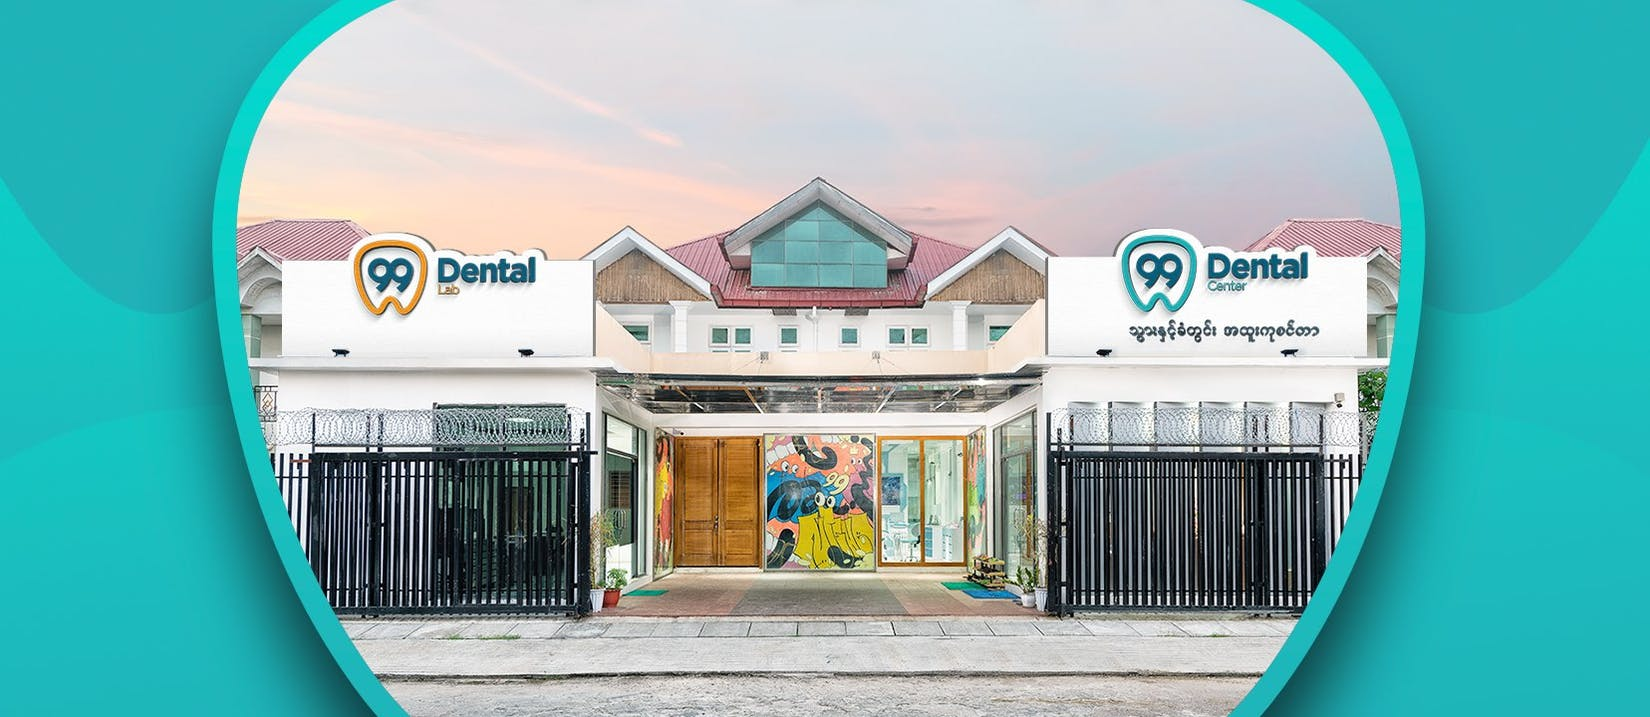 99 Dental clinic | Medical